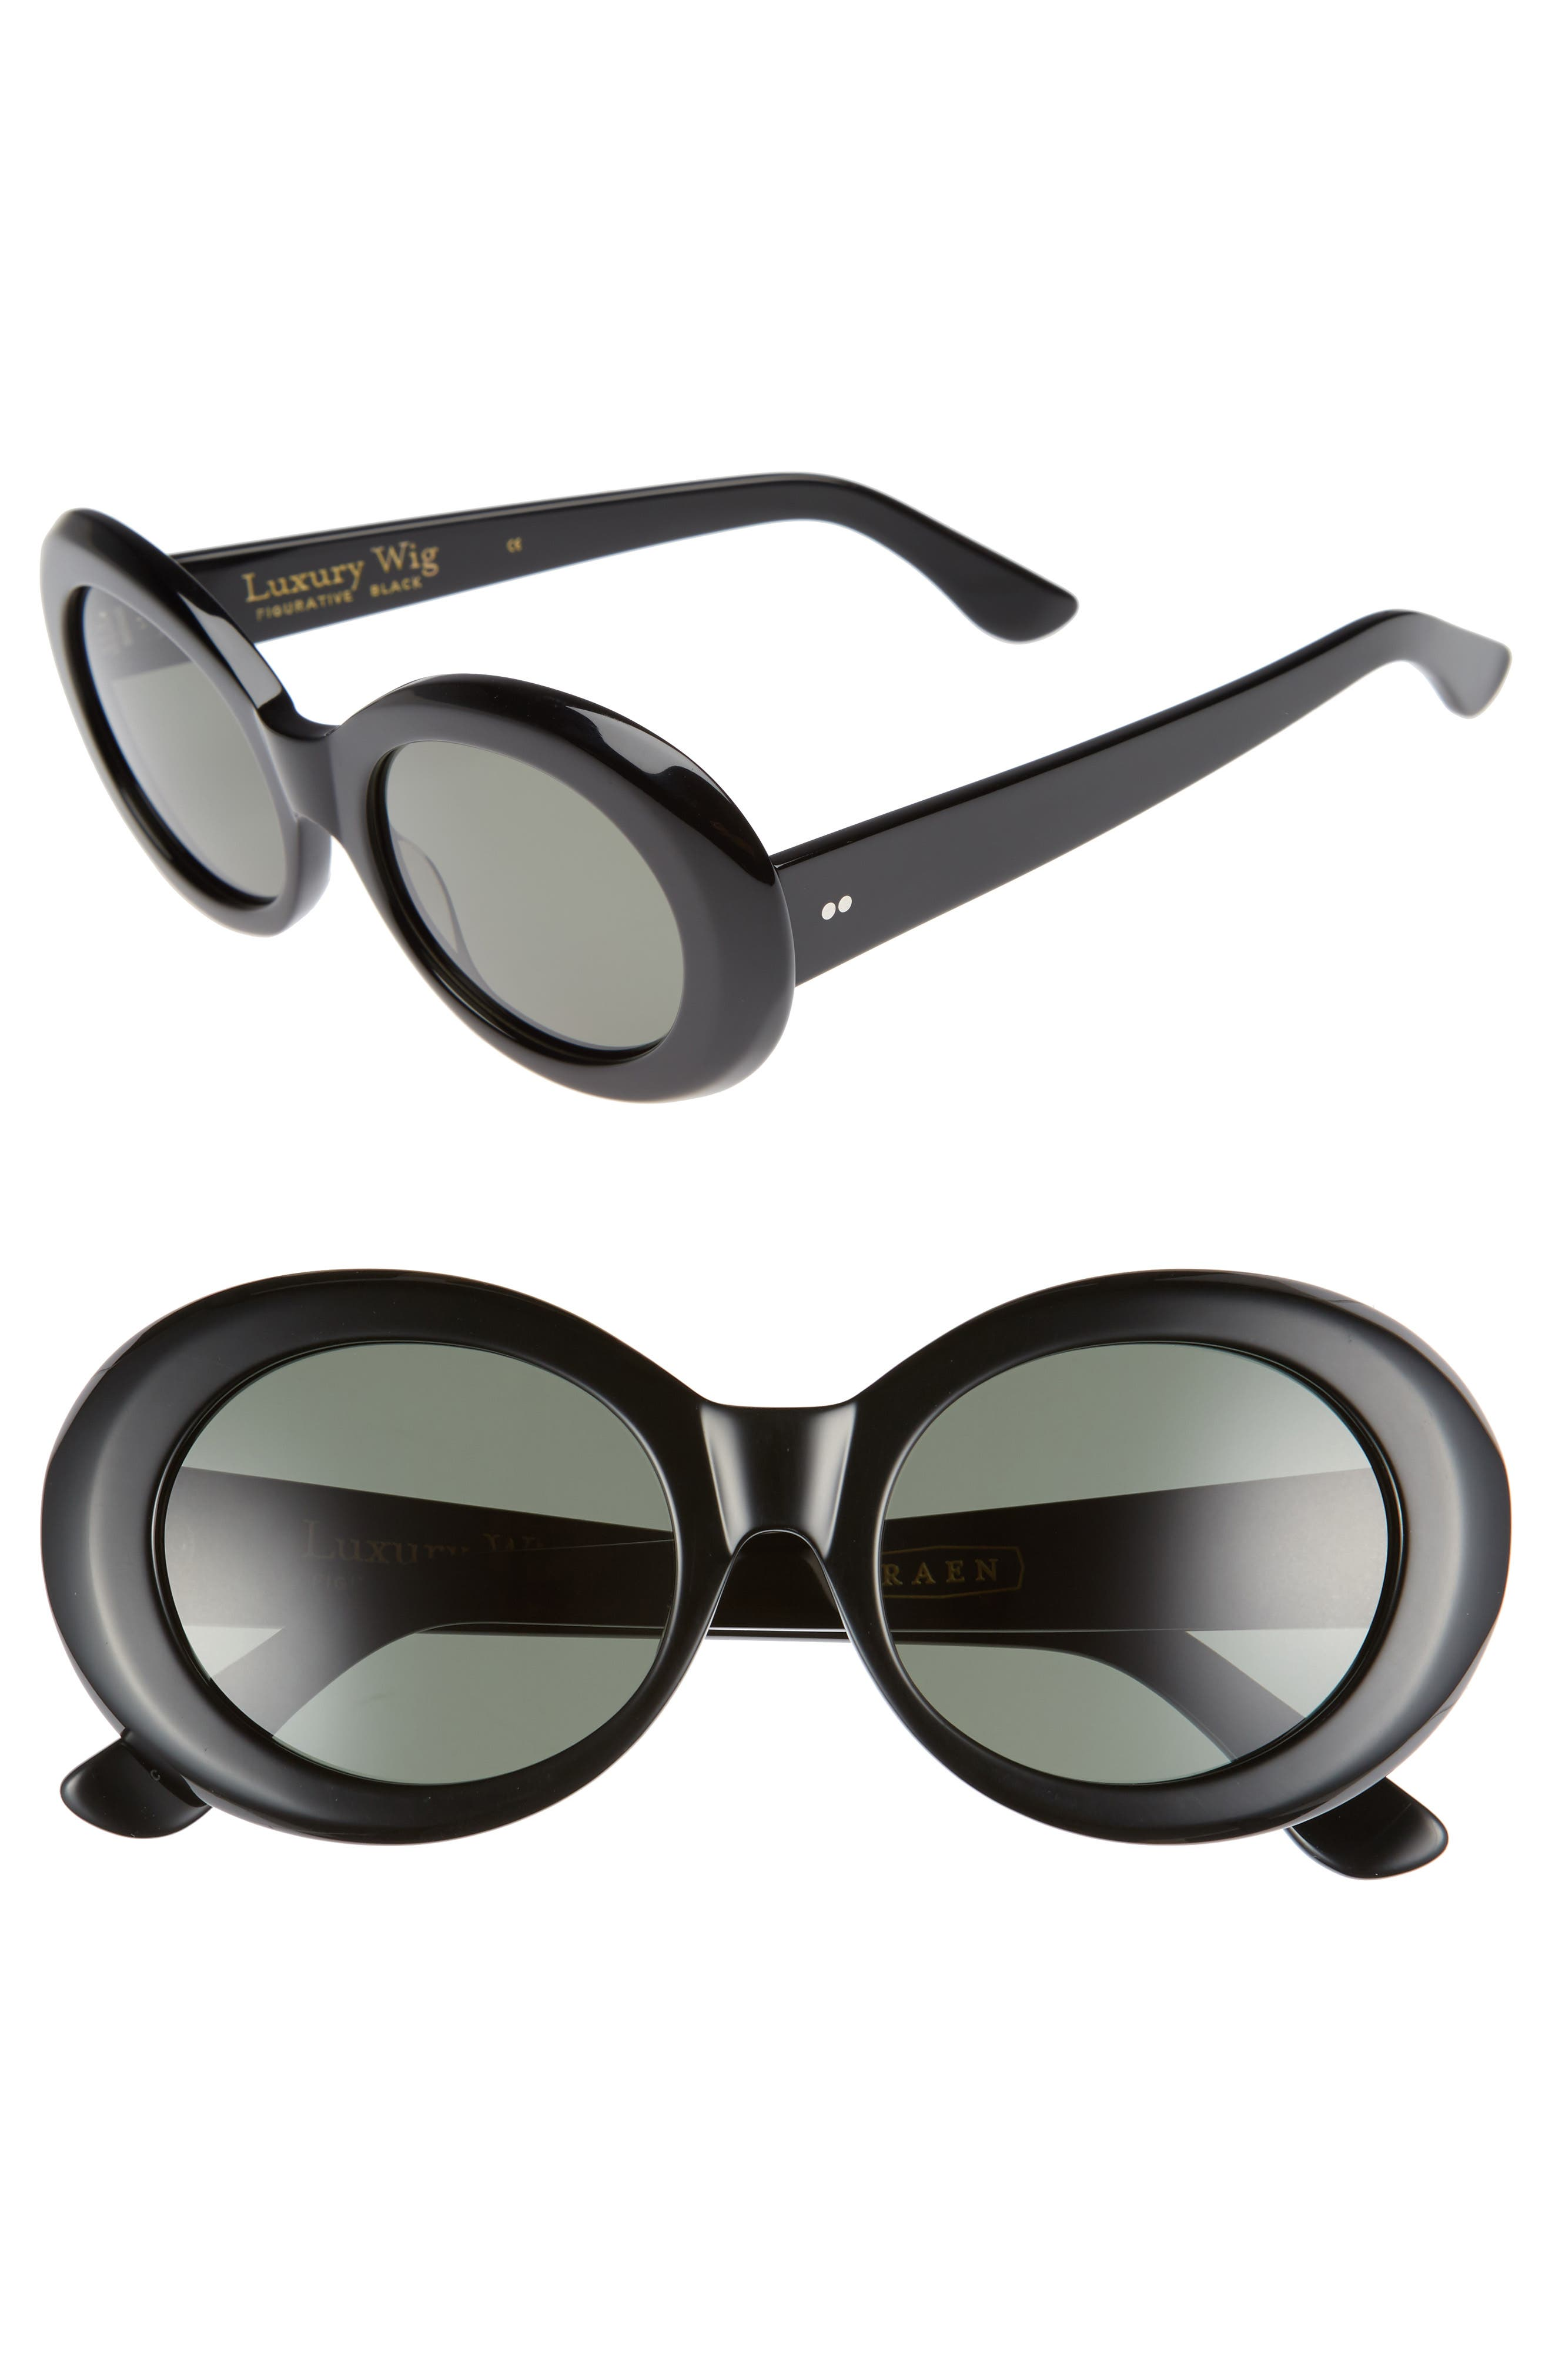 x Alex Knost Luxury Wig Figurative 53mm Sunglasses,                         Main,                         color, 001